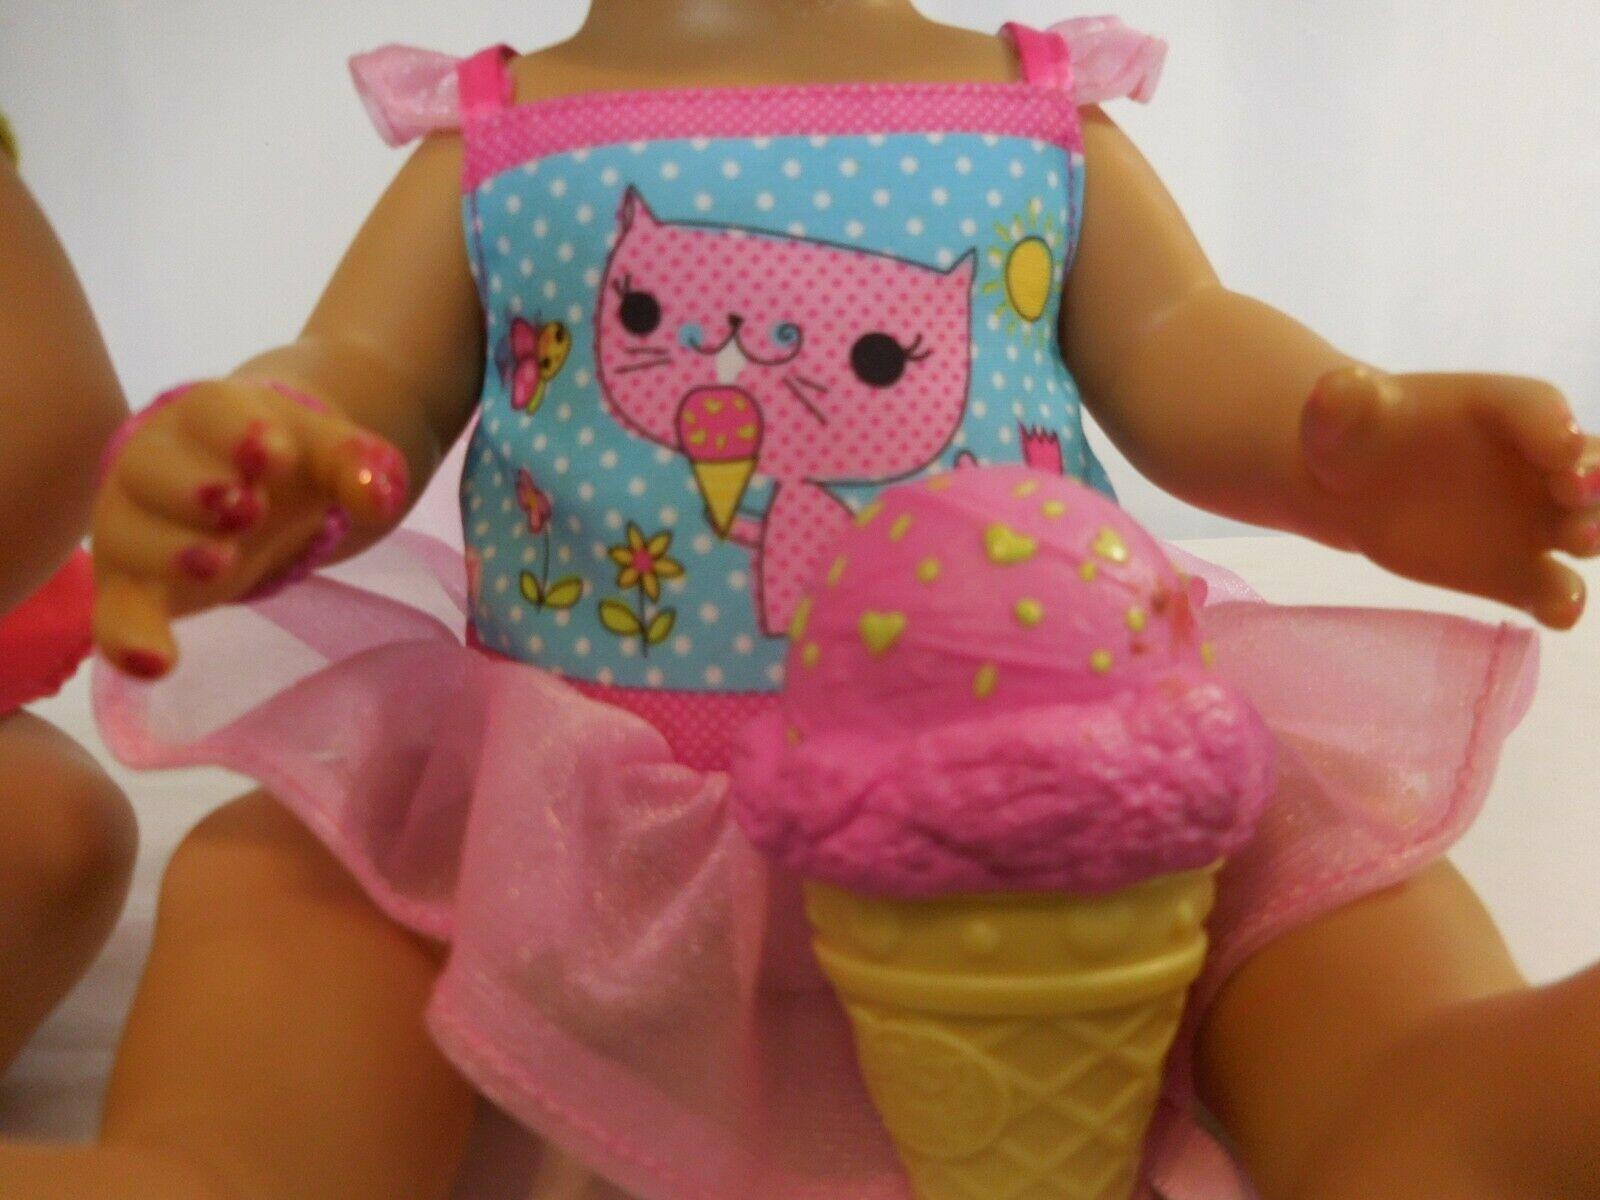 Baby Alive Hispanic Interactive Doll Eats & Poops + Yummy Treats Licks Ice Cream image 3